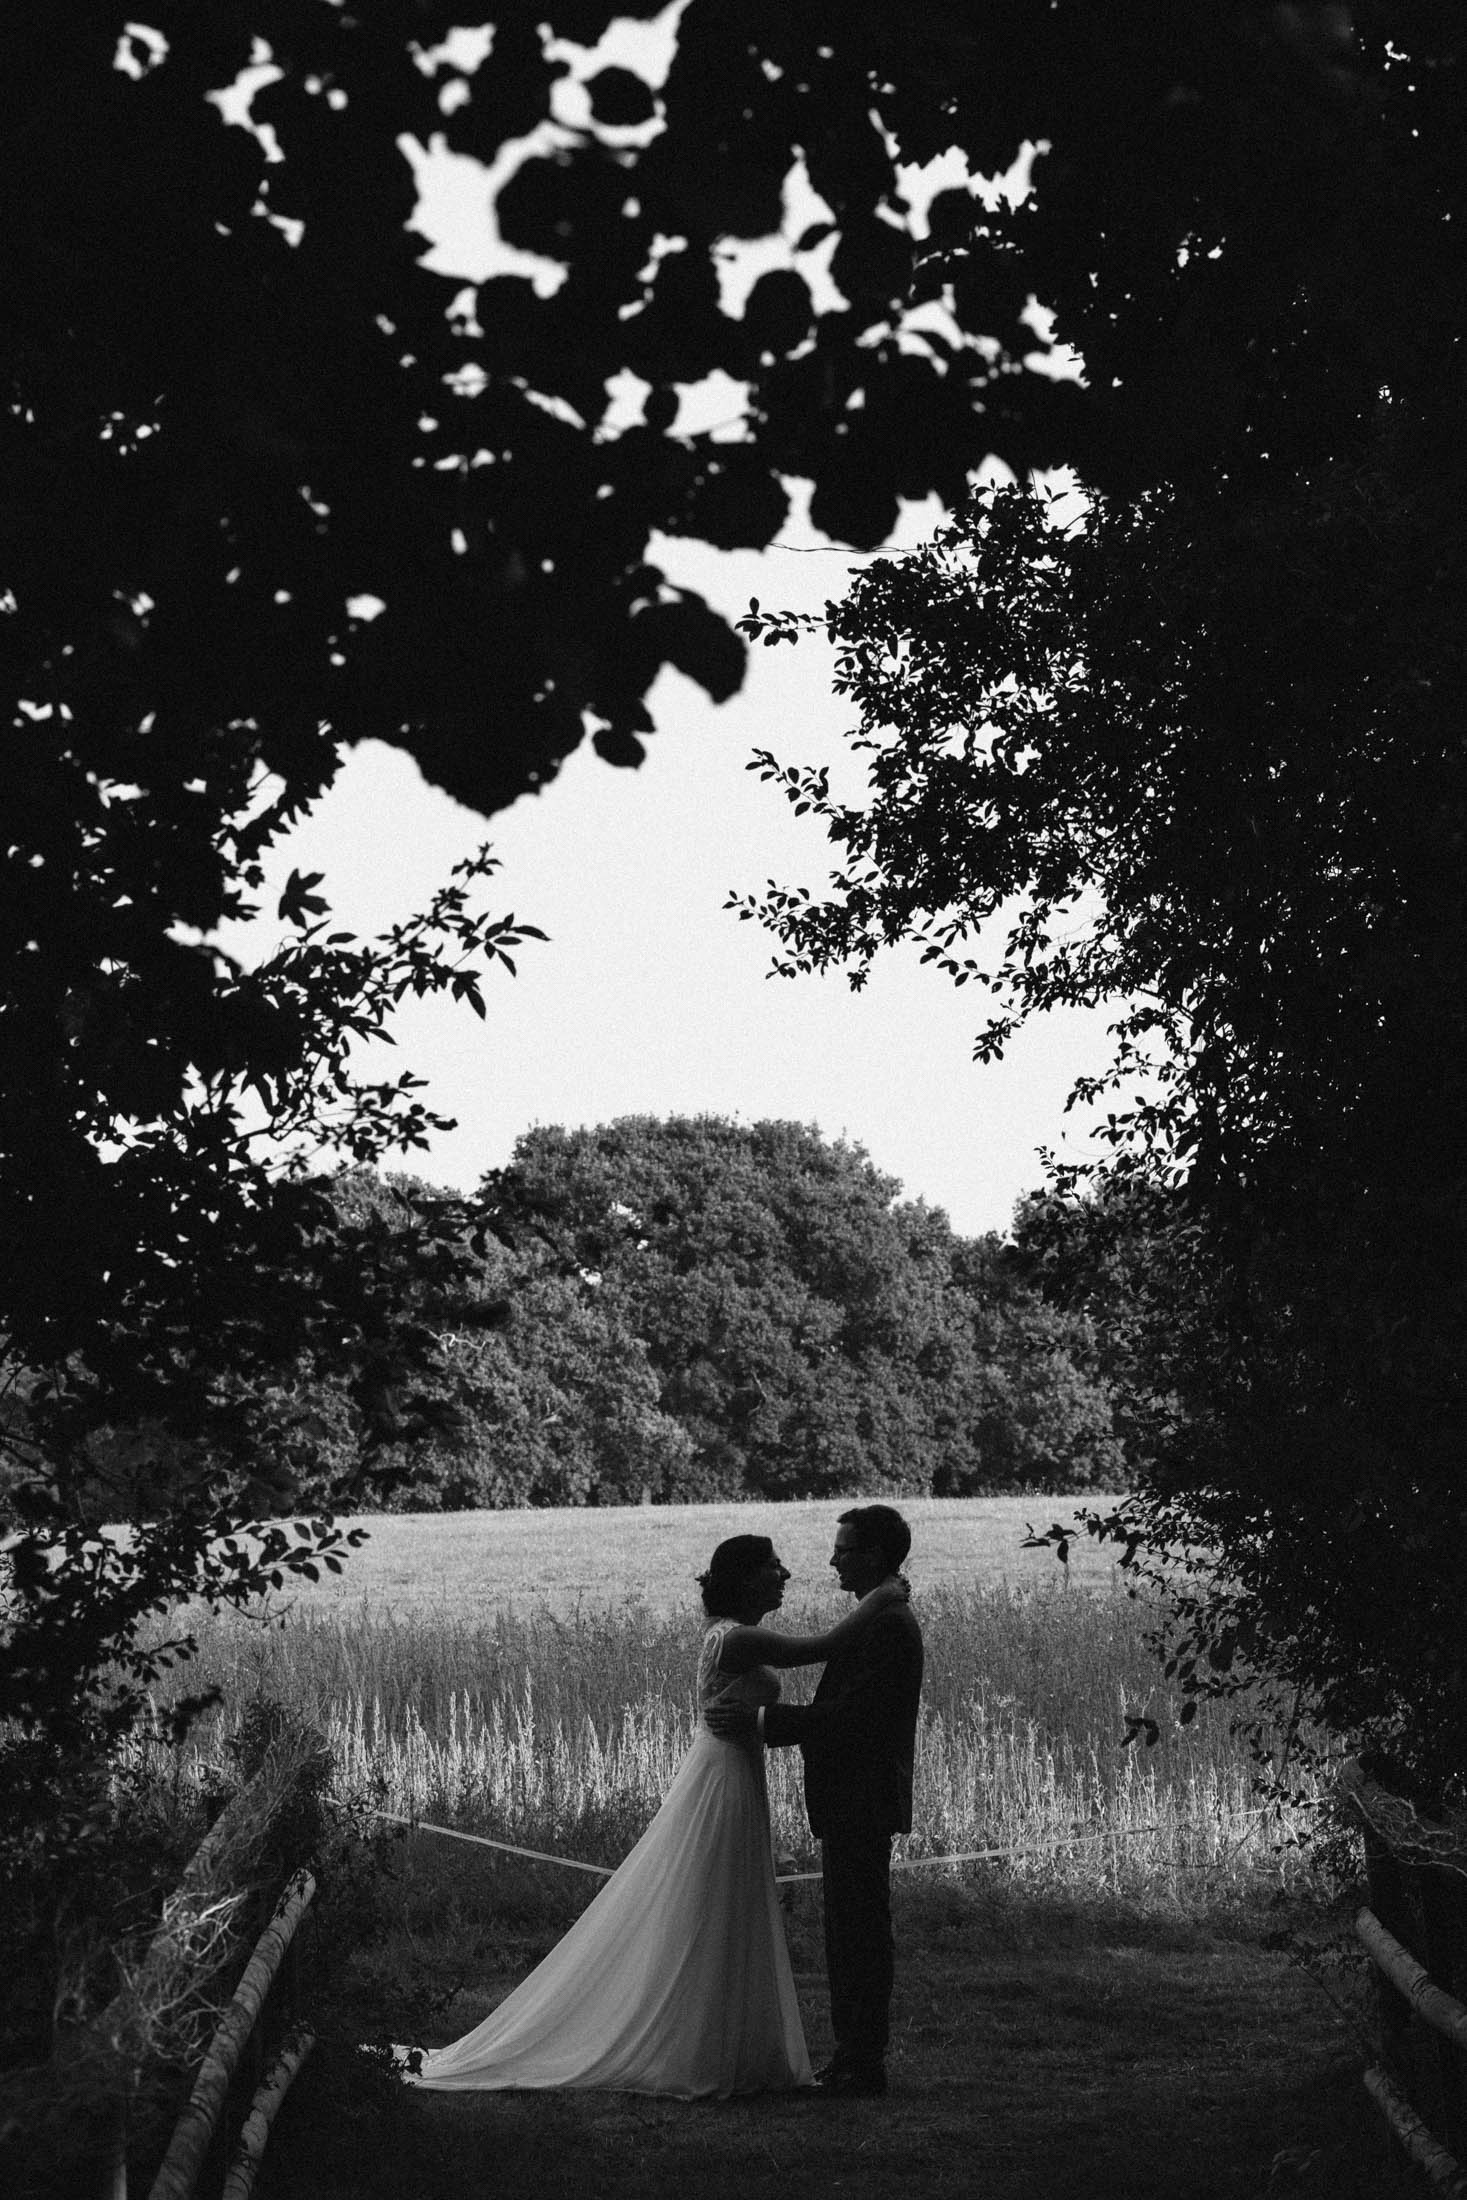 JessicaJillPhotography-HarewoodsHomeFarmWedding-SouthEastWeddingPhotographer-59.jpg